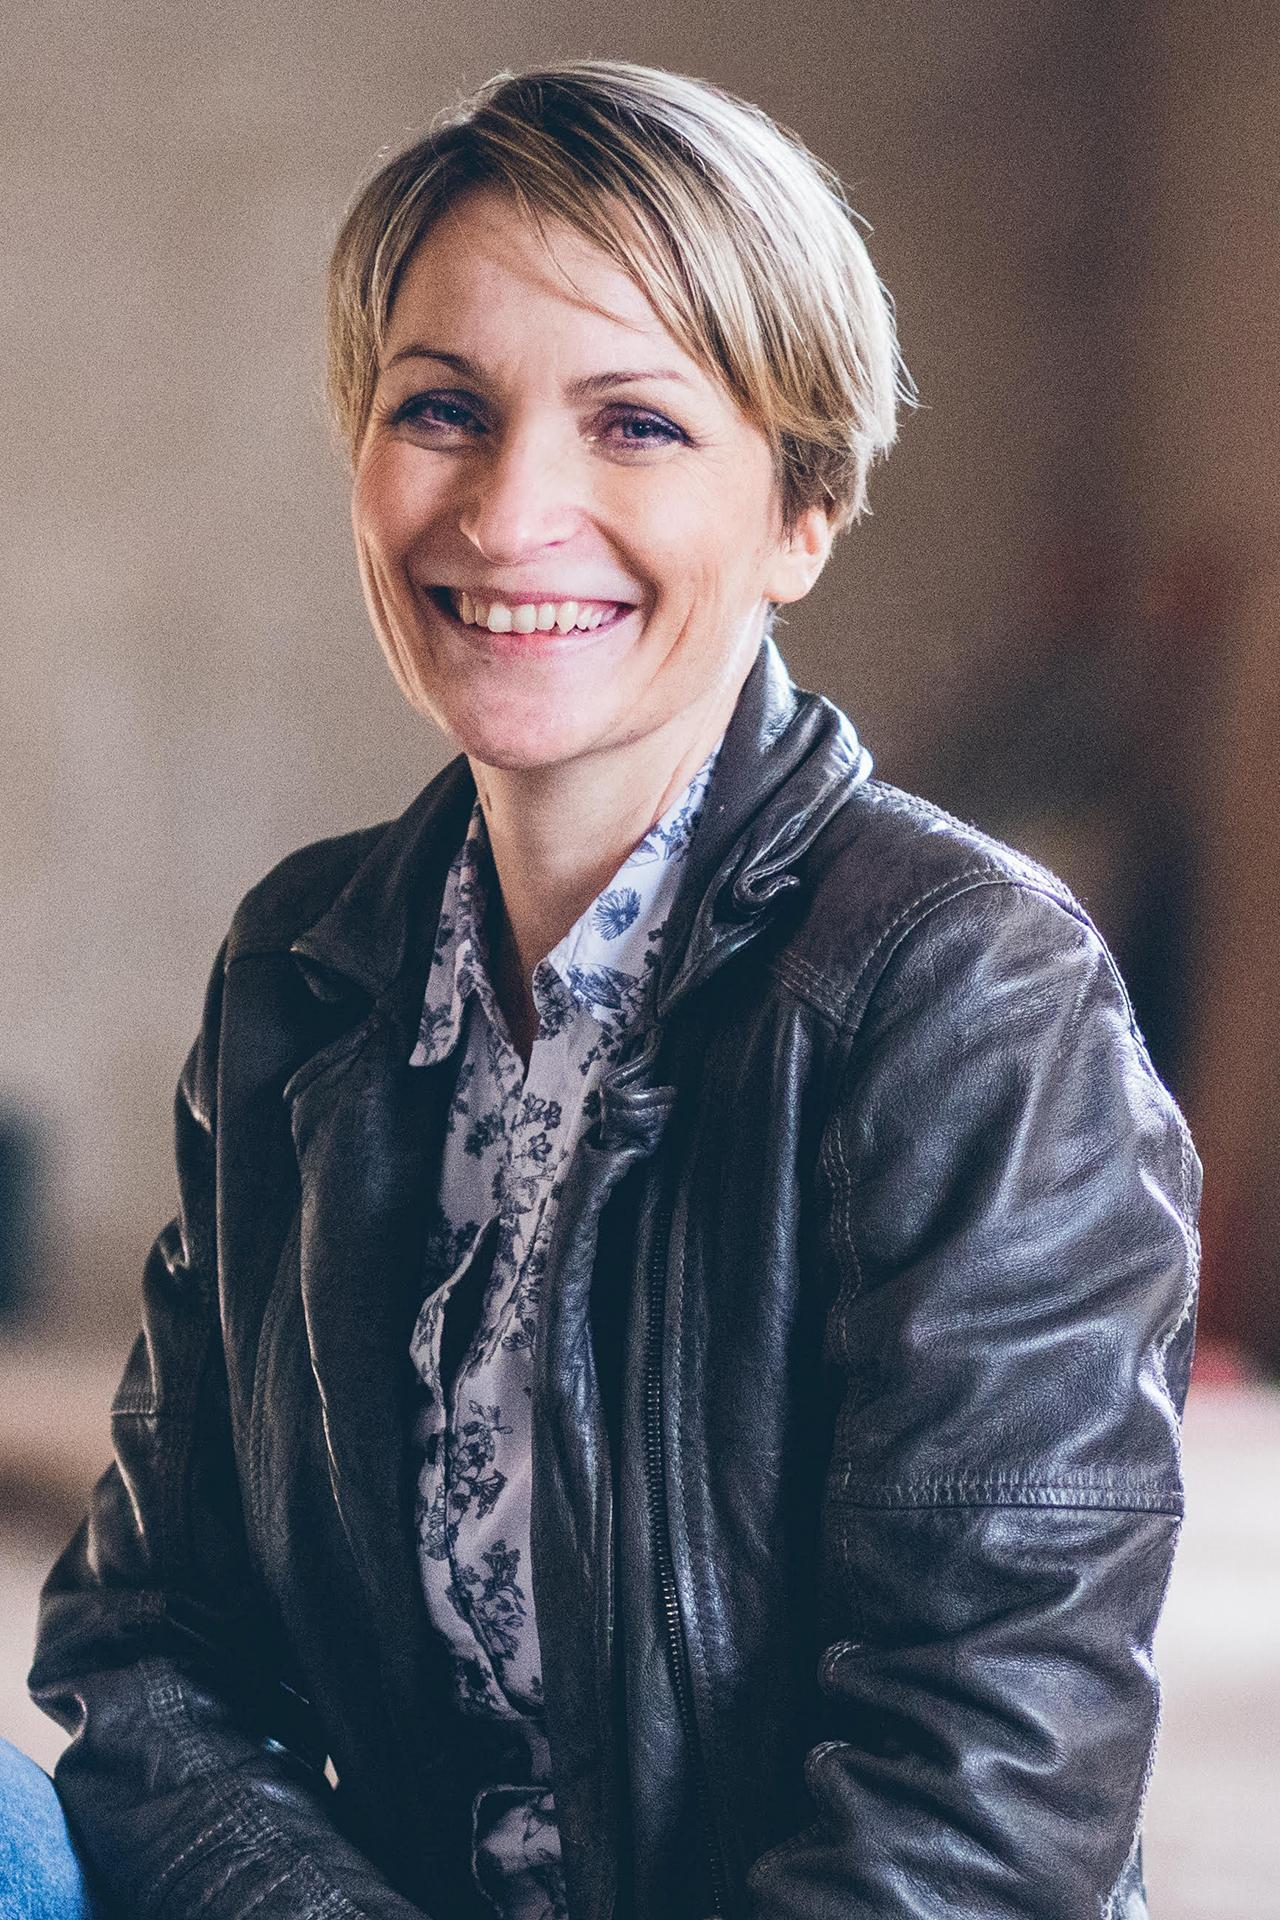 Doreen Heydenbluth-Peters